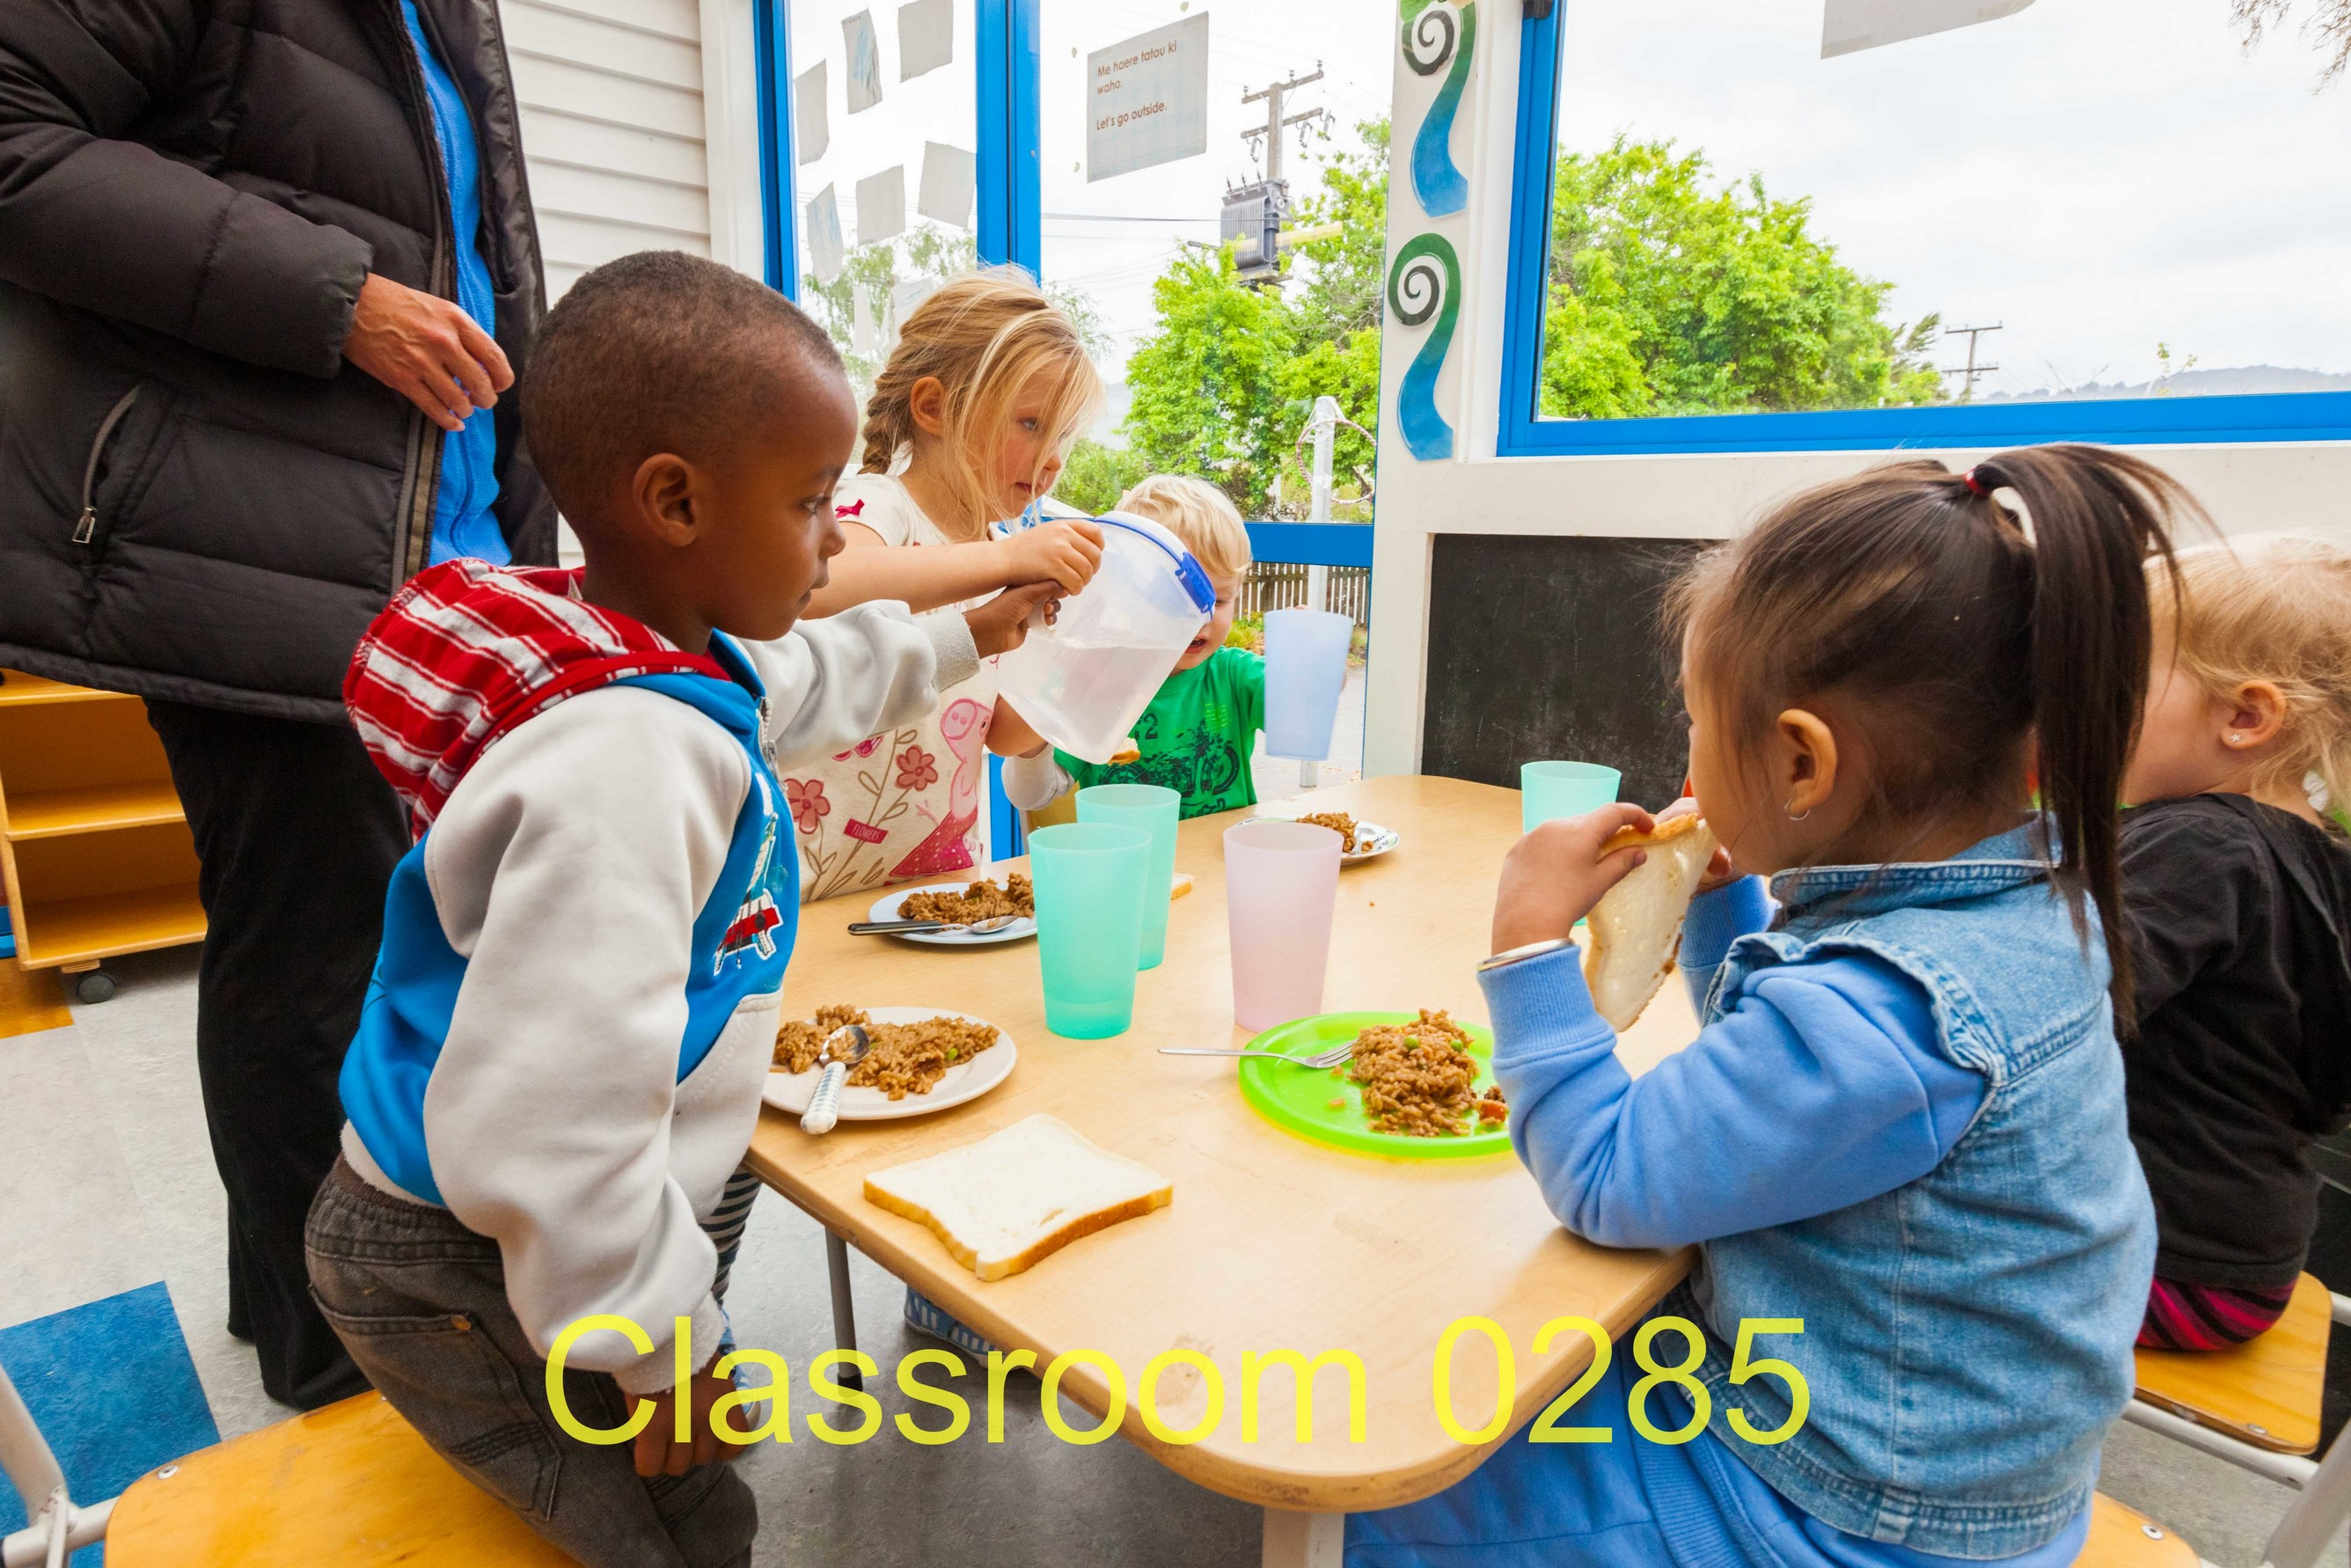 Classroom 0285